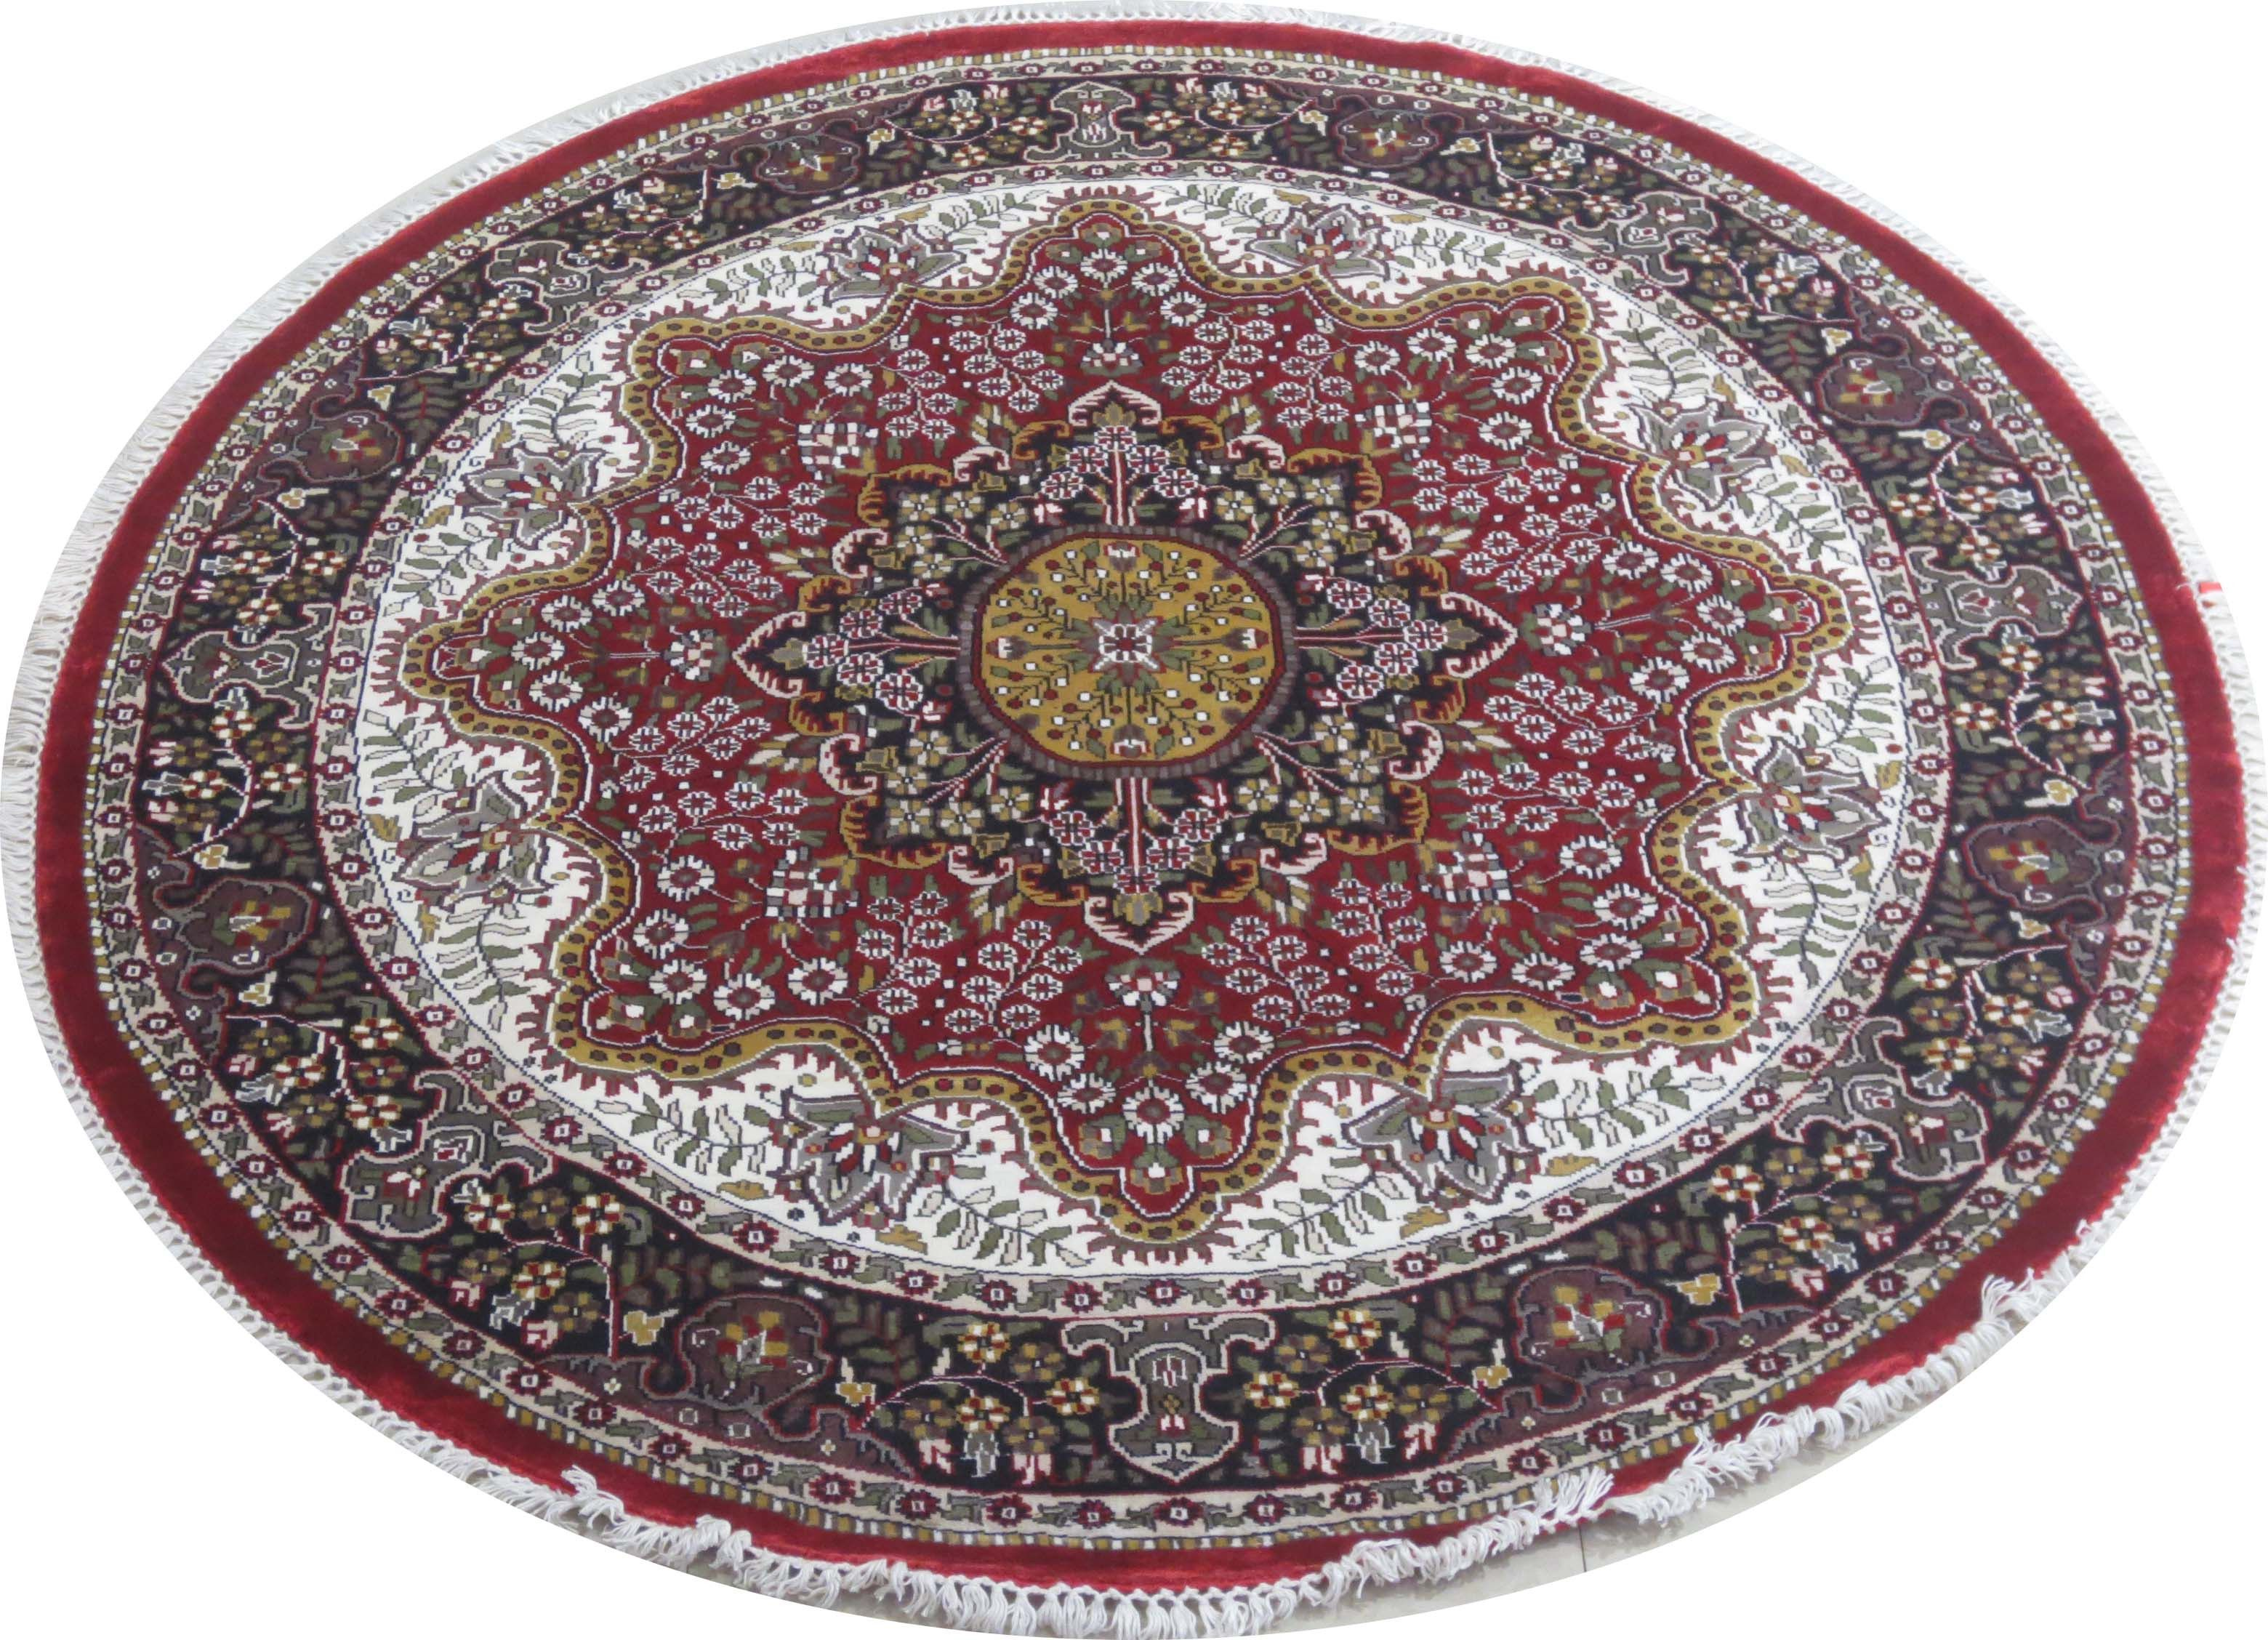 Rich Floral Persian Design Rug For Sale Kashmir Silk Round Handmade Rug 6 X 6 Handmade Rug Rugs Persian